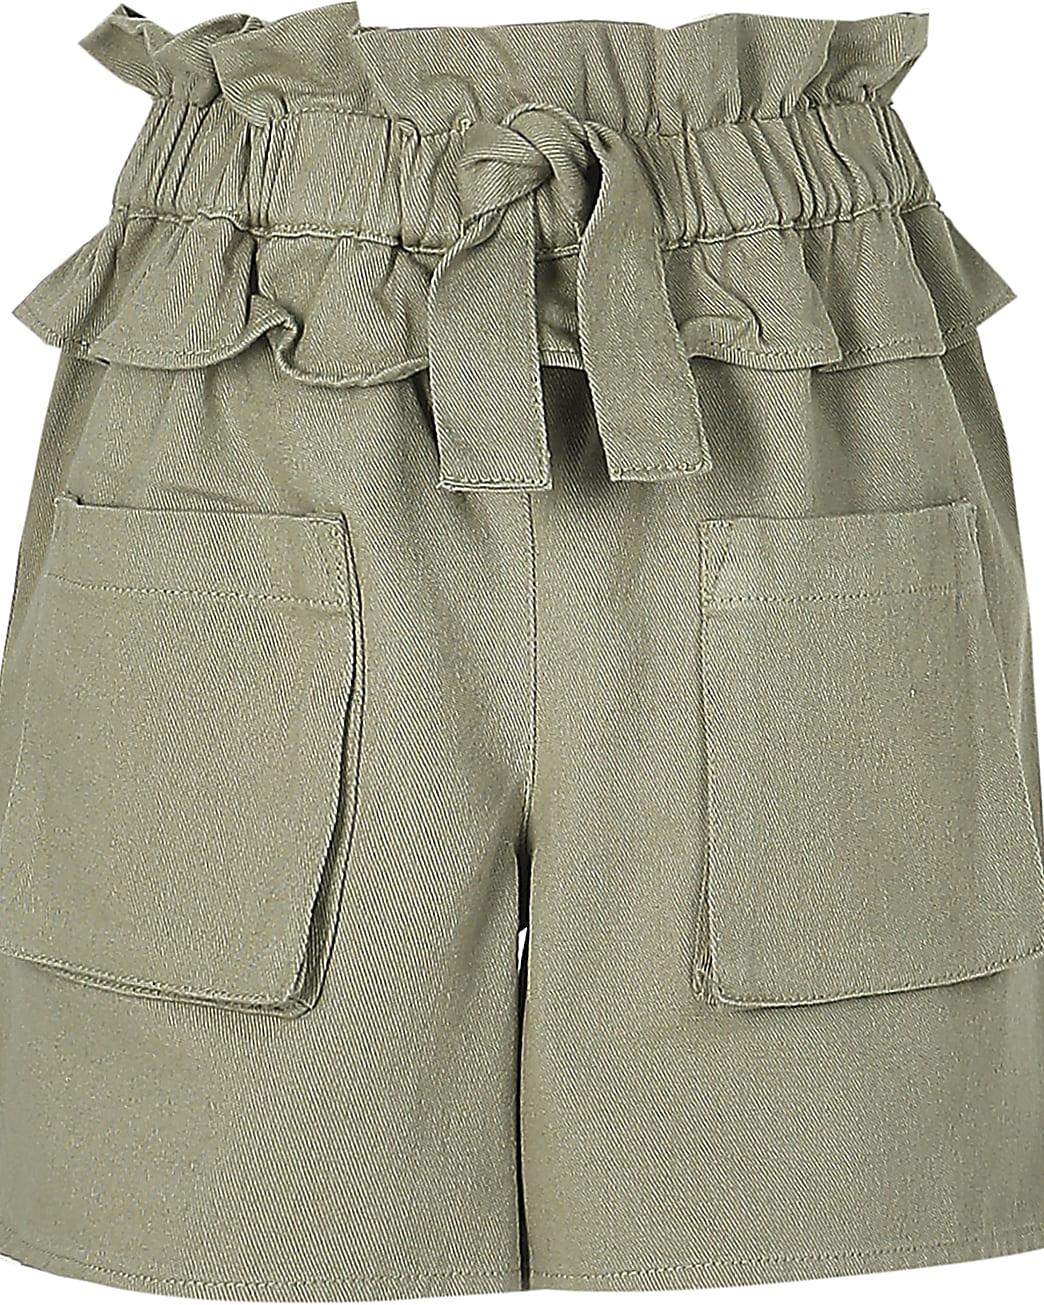 Girls khaki frill tie waist shorts